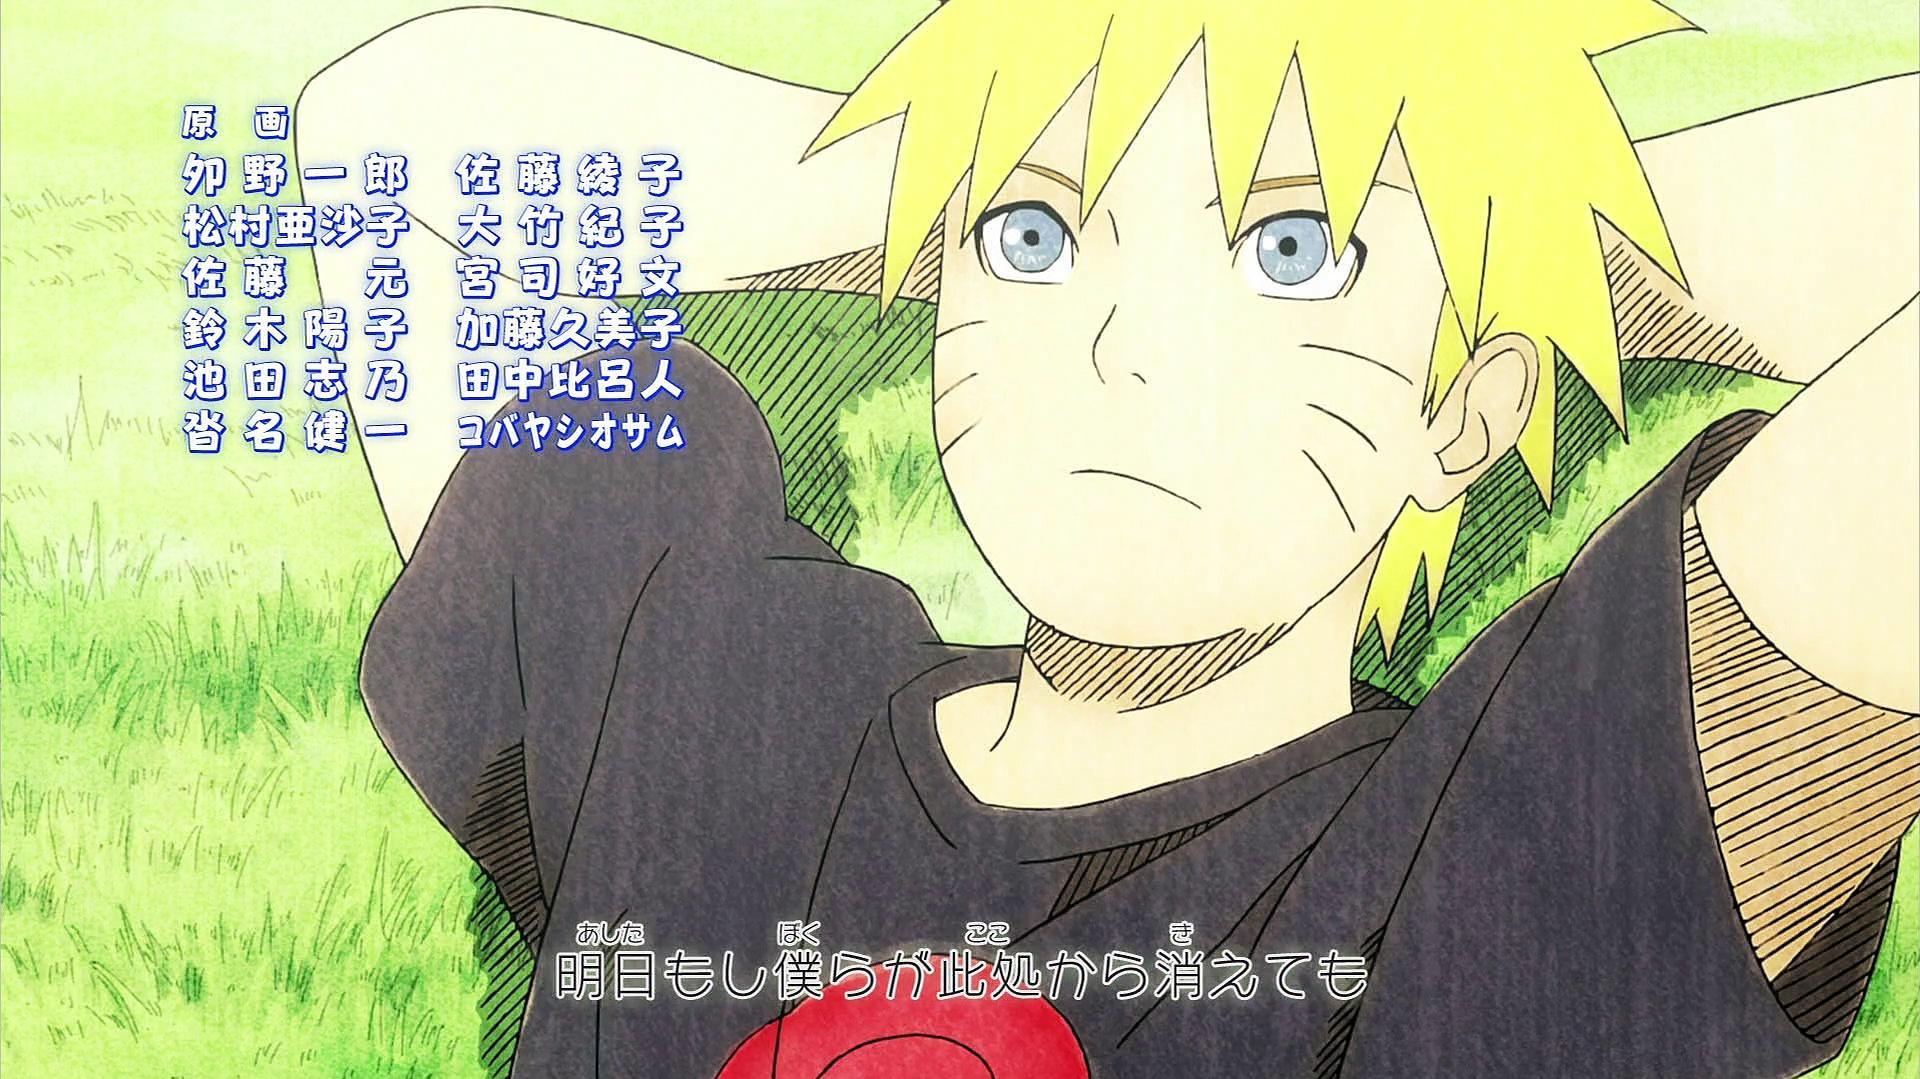 Naruto Shippuden - Ending 39 HD